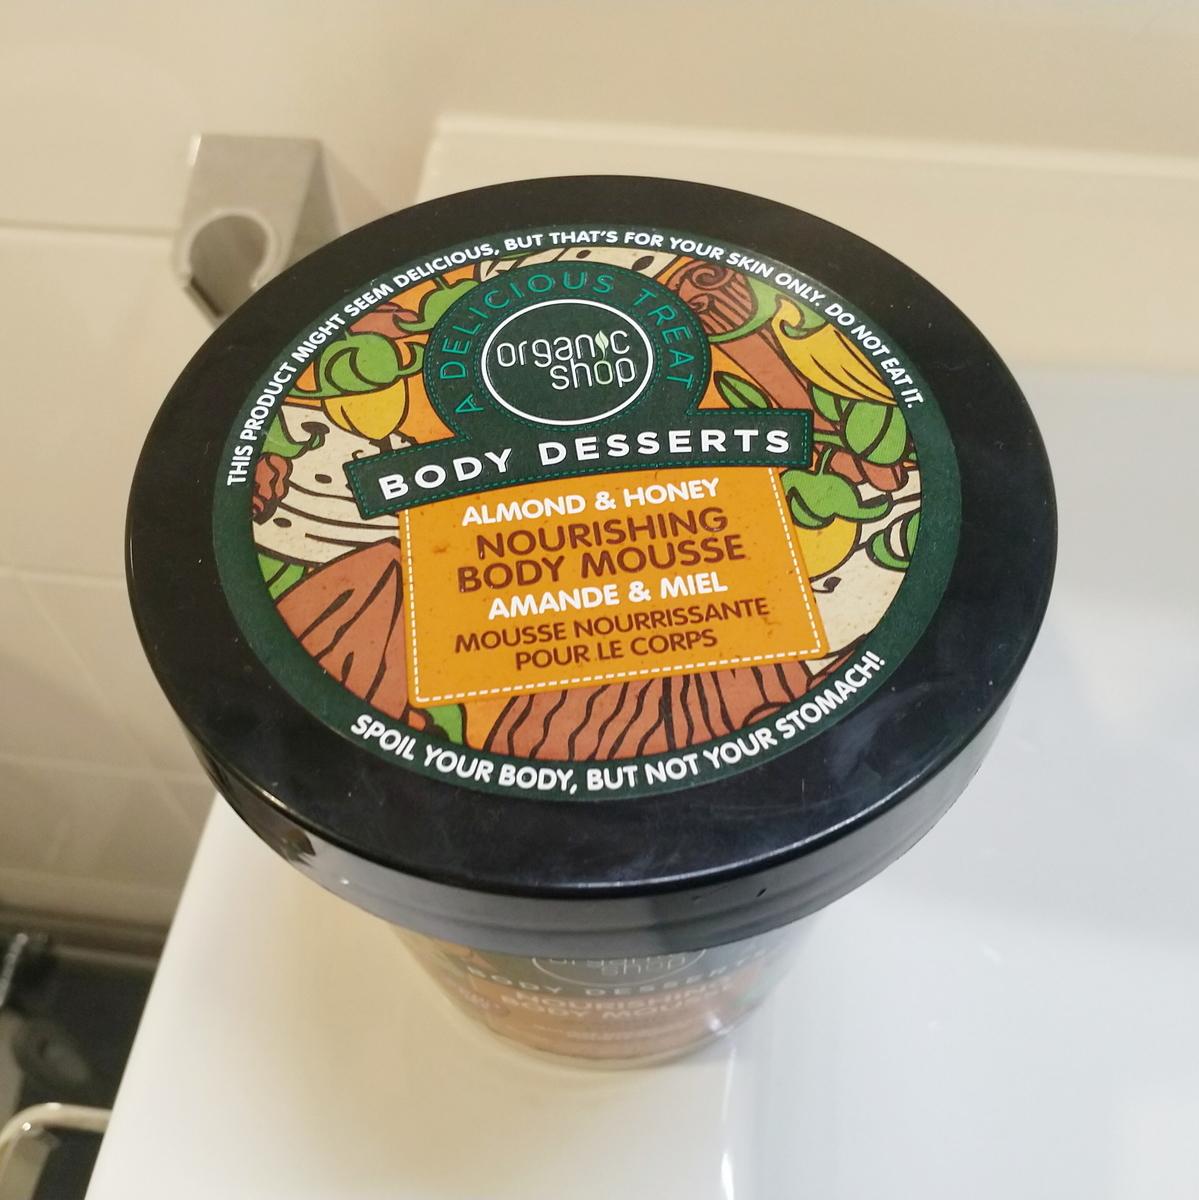 Organic shop Body Desserts Almond & Honey